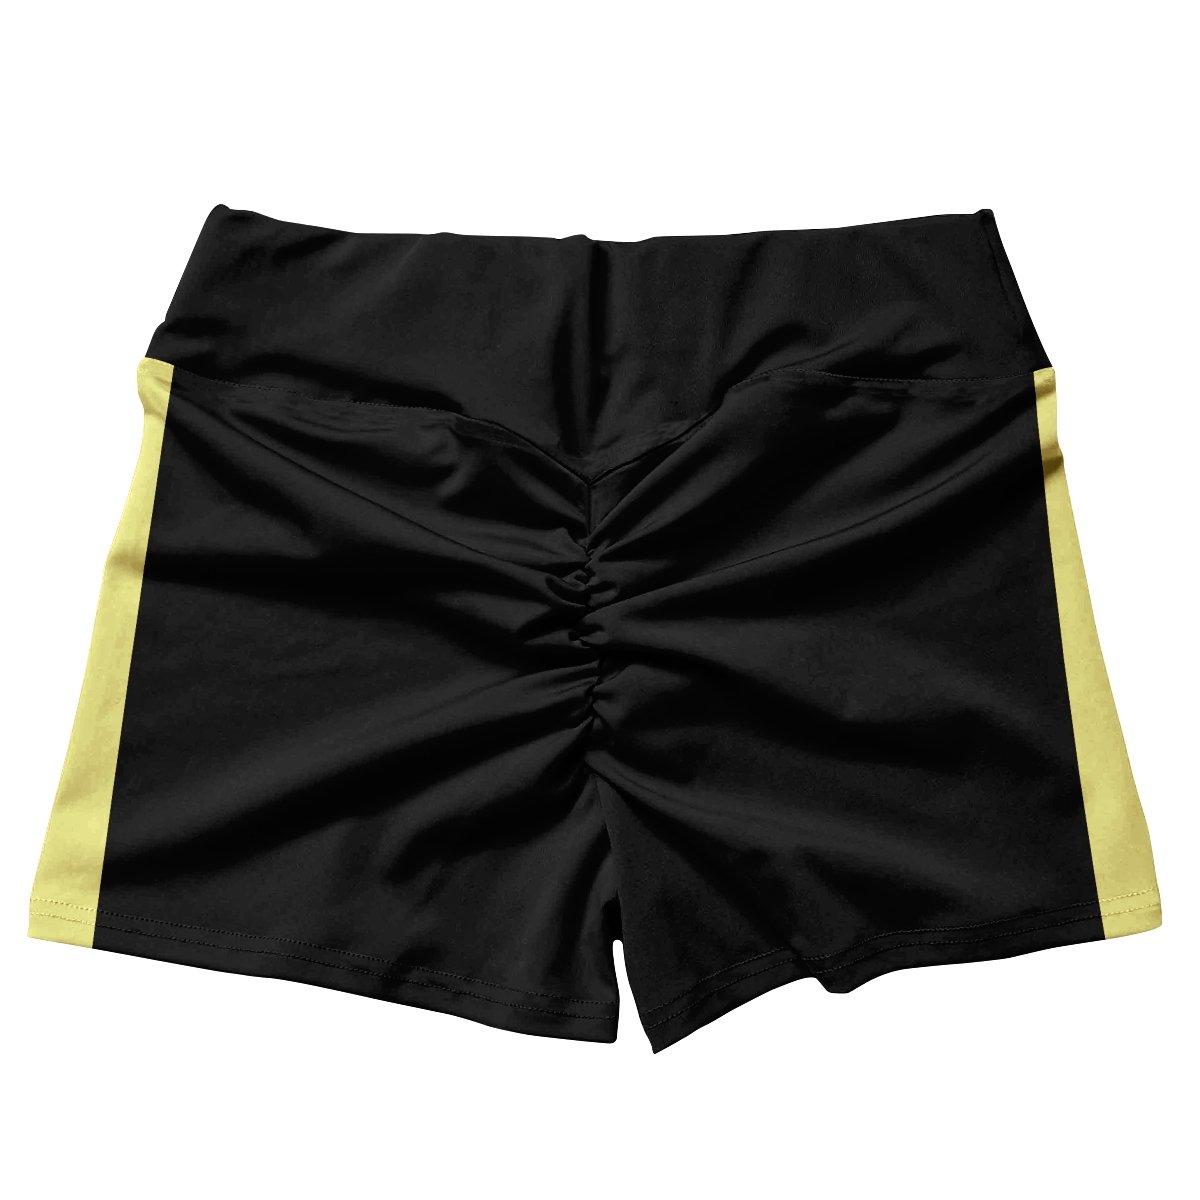 team fukurodani active wear set 184143 - Anime Swimsuits